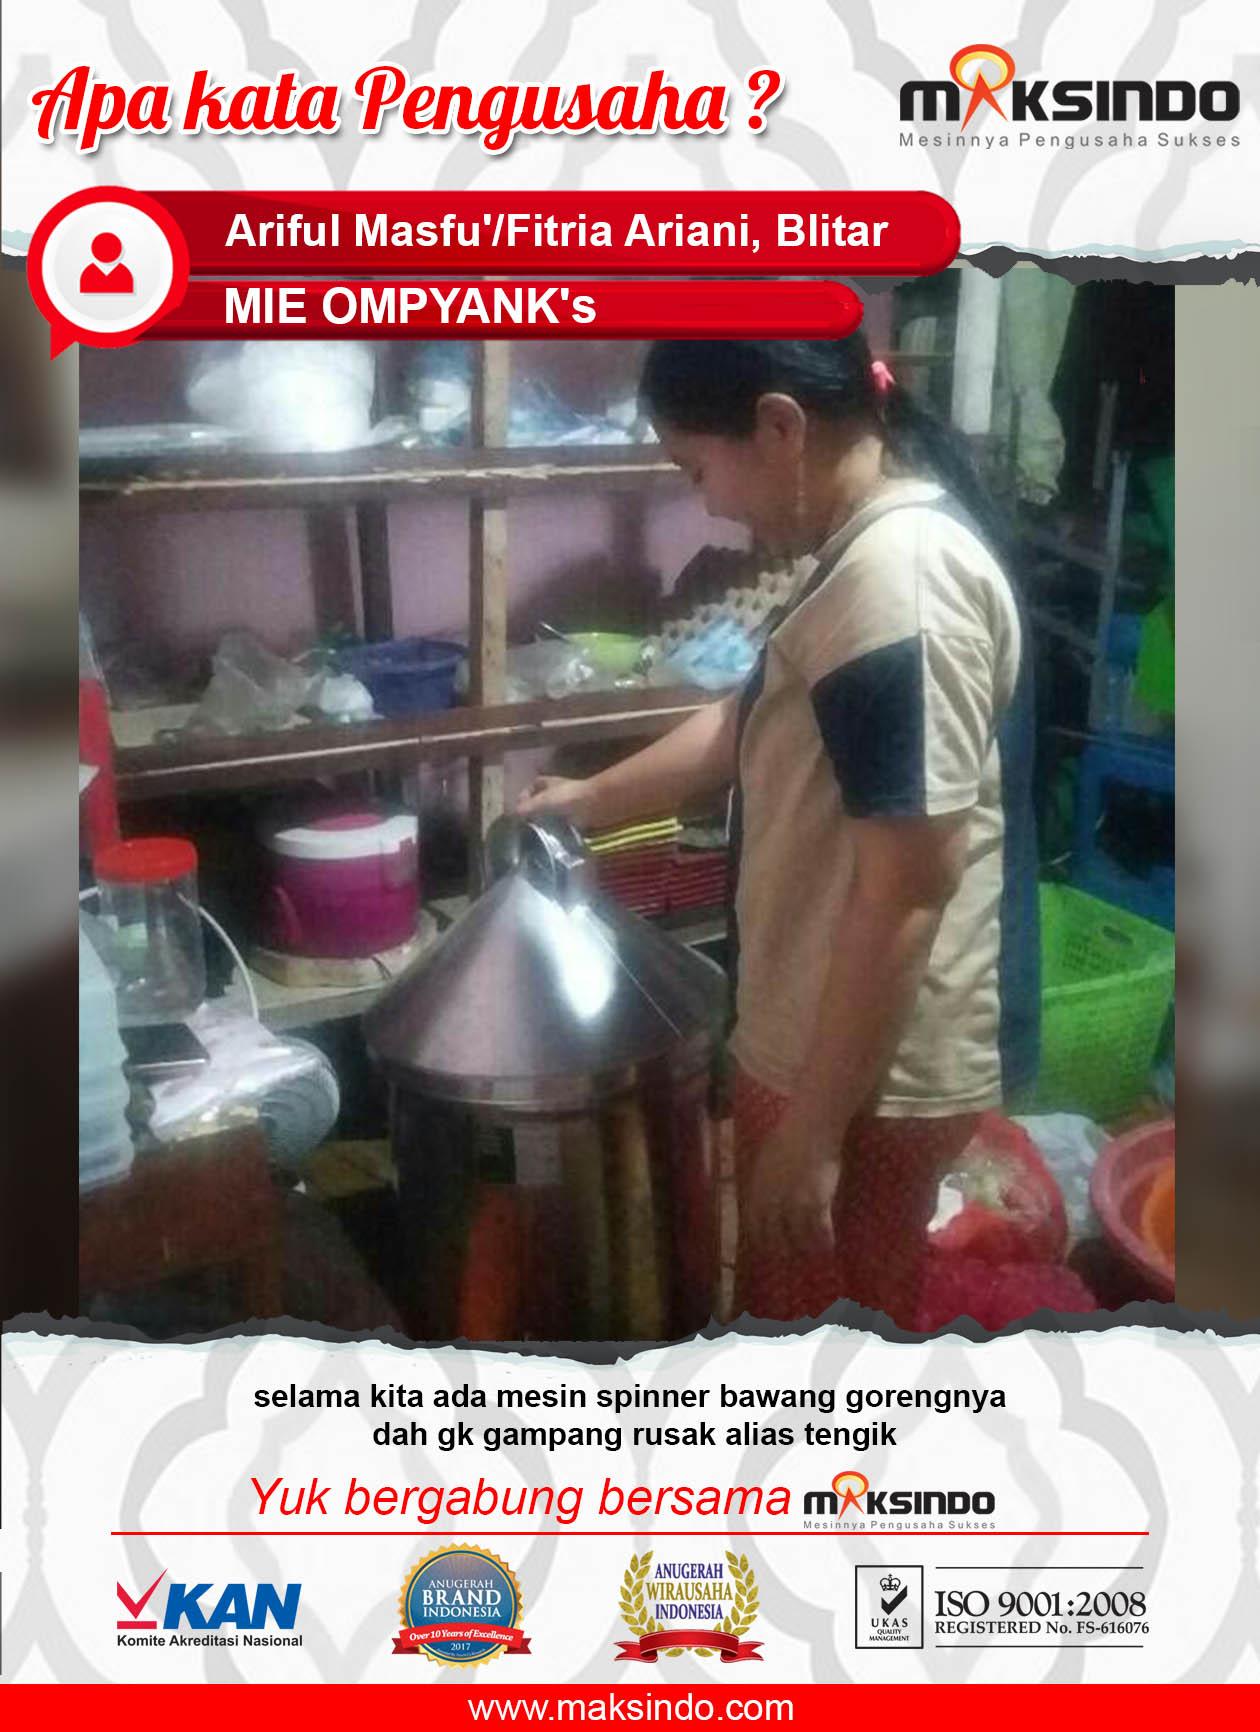 MIE OMPYANK's : Mesin Spinner  Maksindo untuk Menggoreng Bawang Tidak Tengik atau Rusak